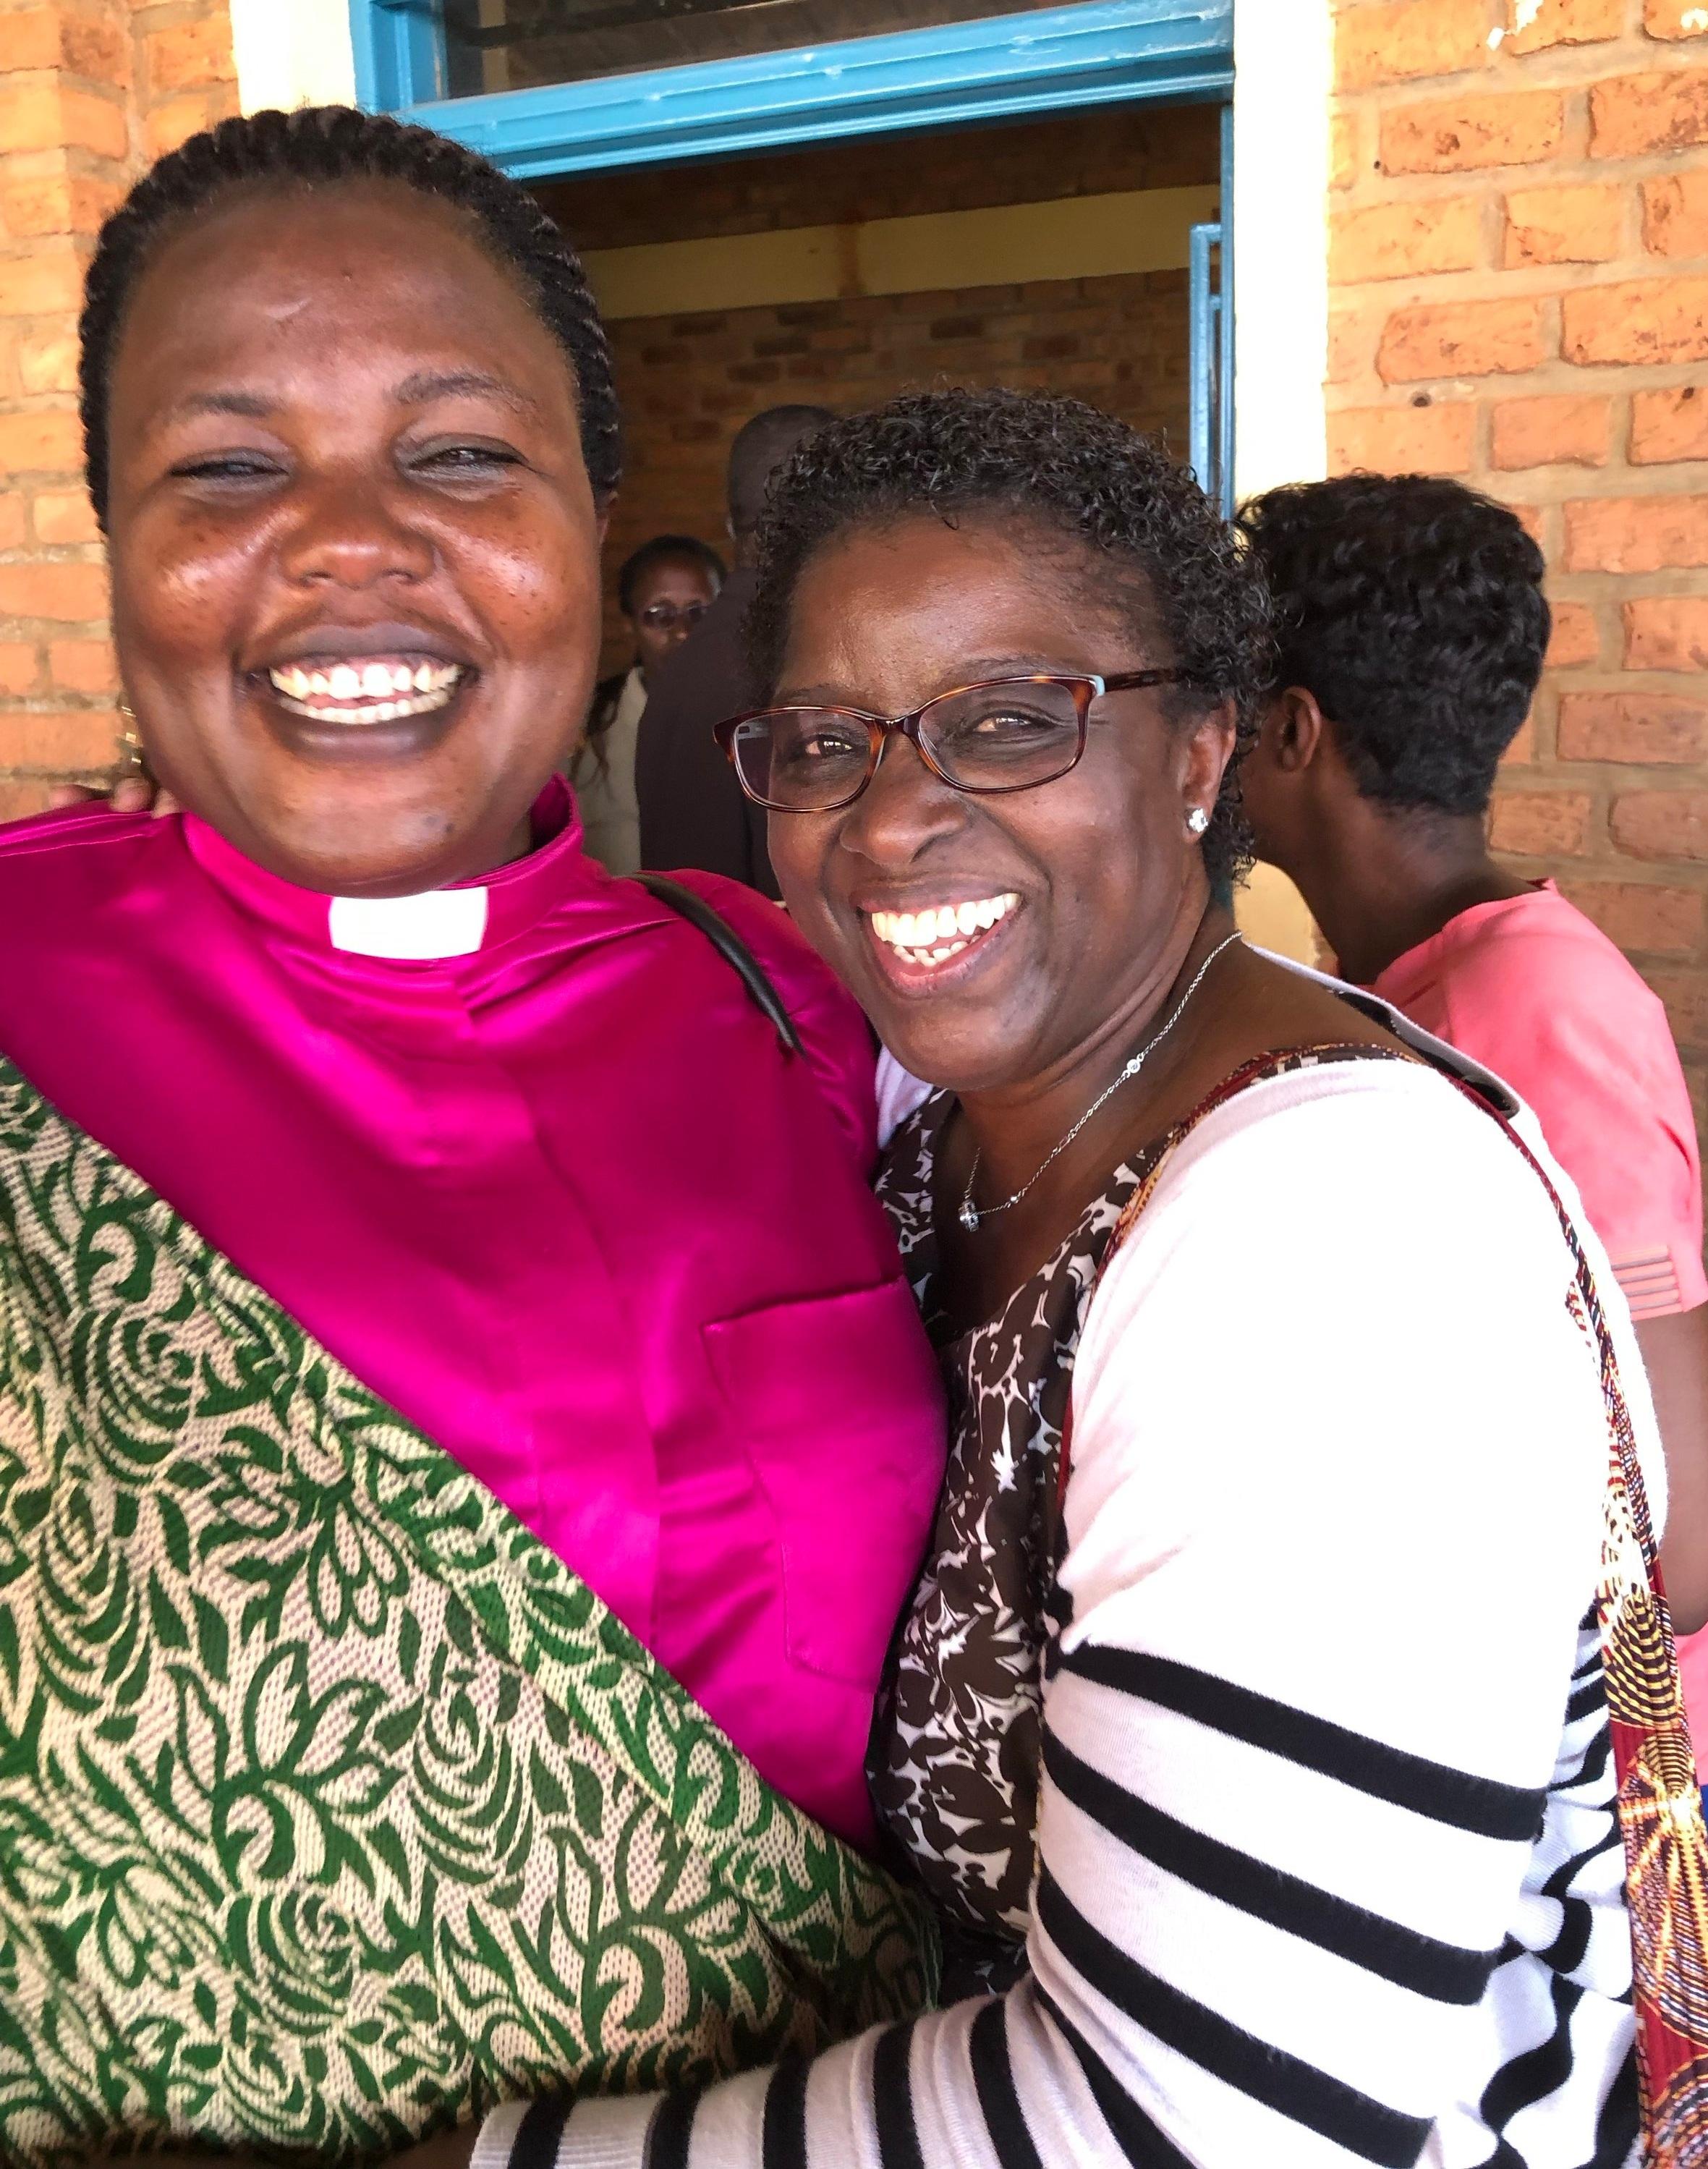 Rev. Julie and Ebralie